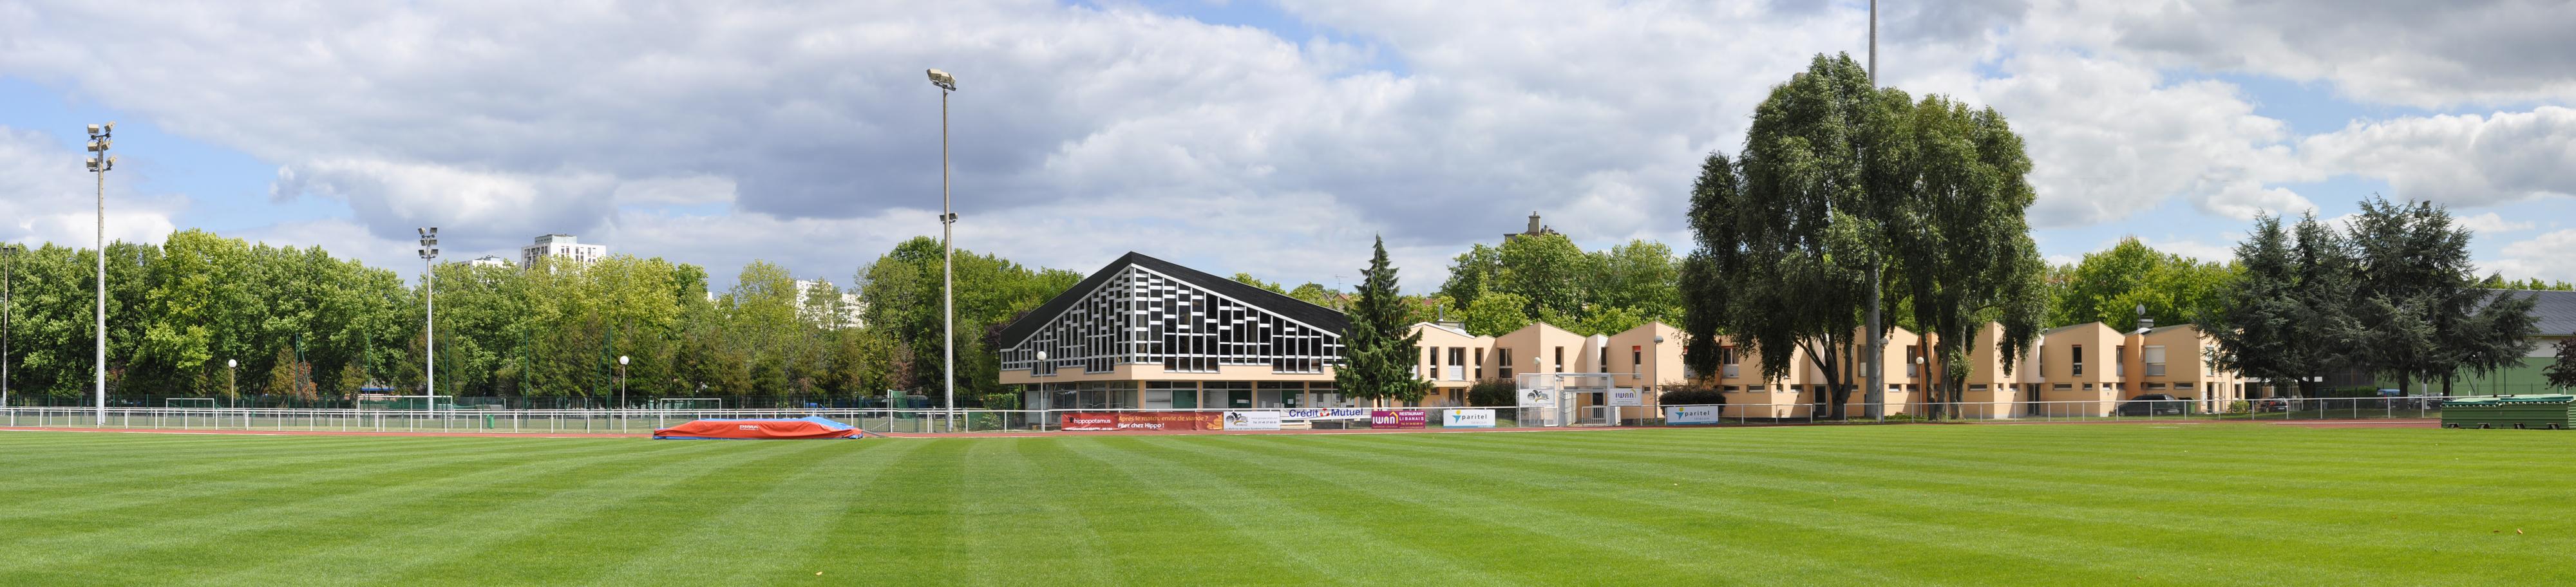 parc_des_sports_panorama.jpg